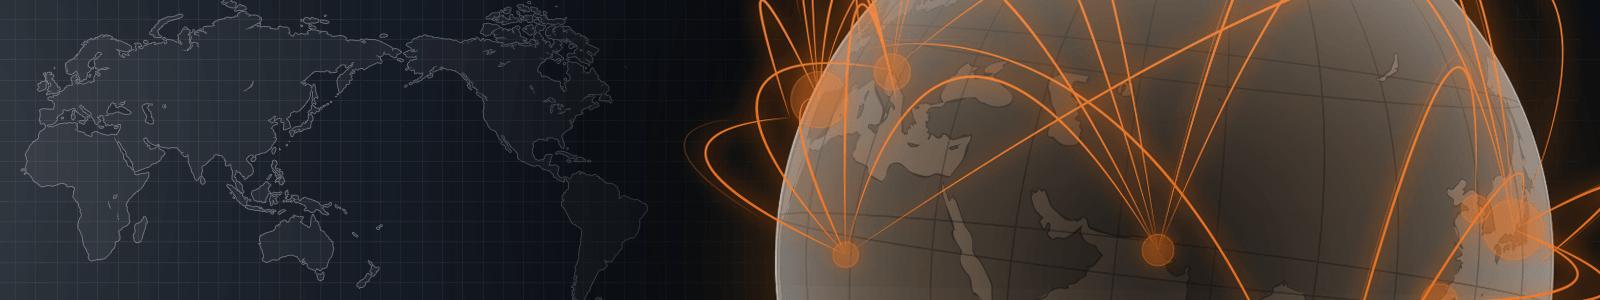 Worldwide Socal Network